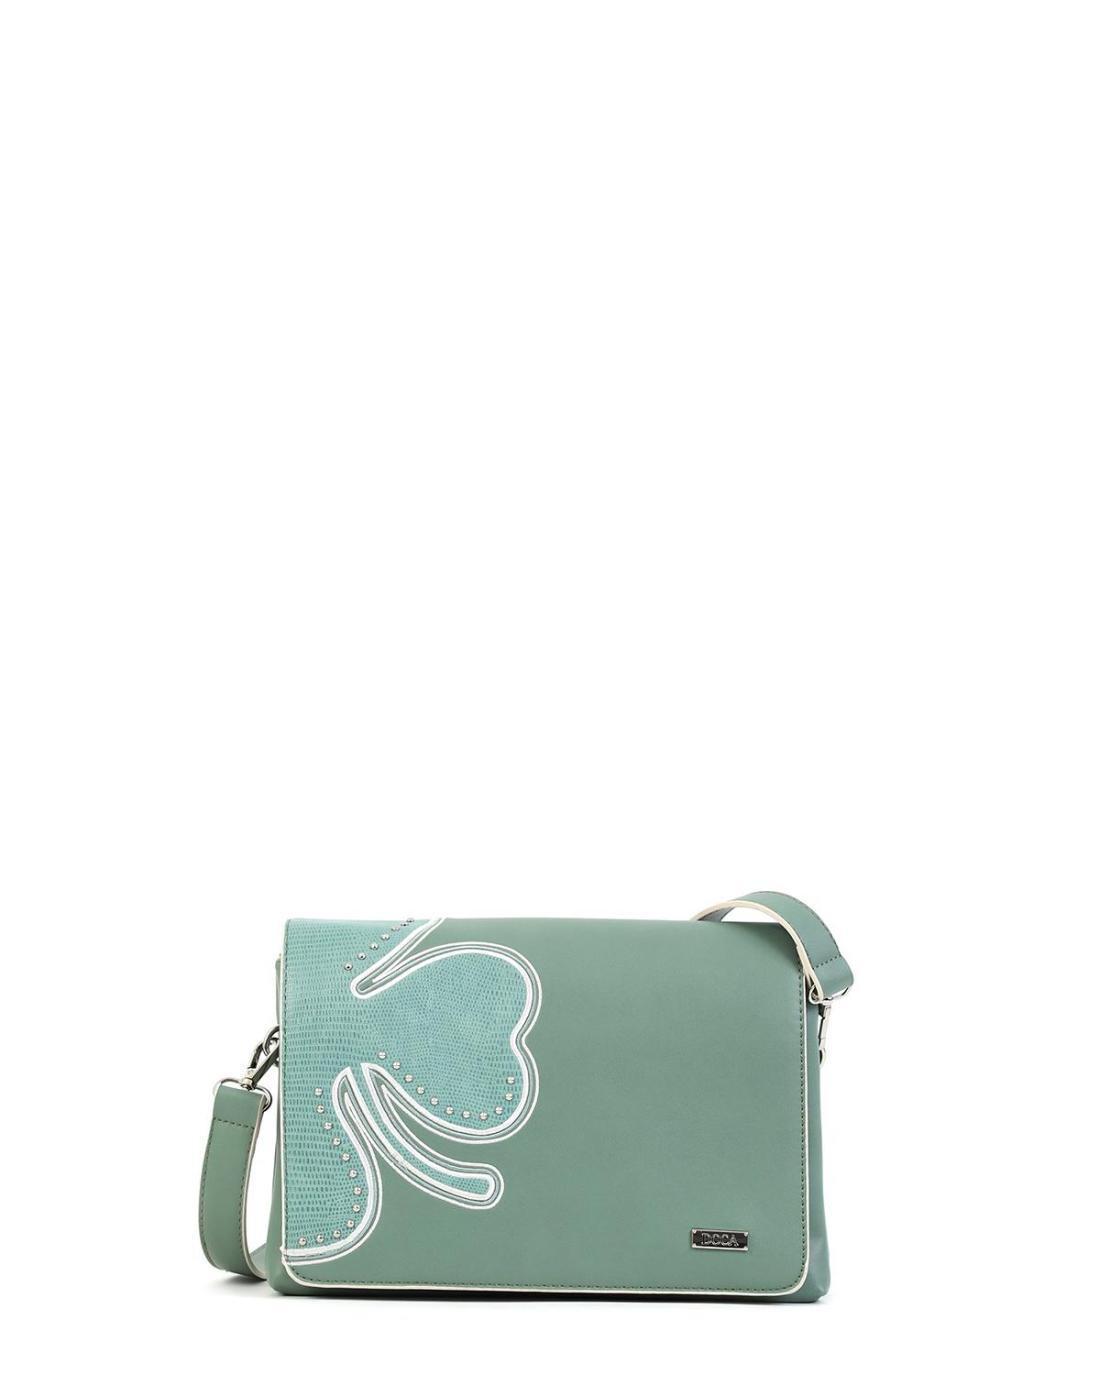 Mint green cross body bag